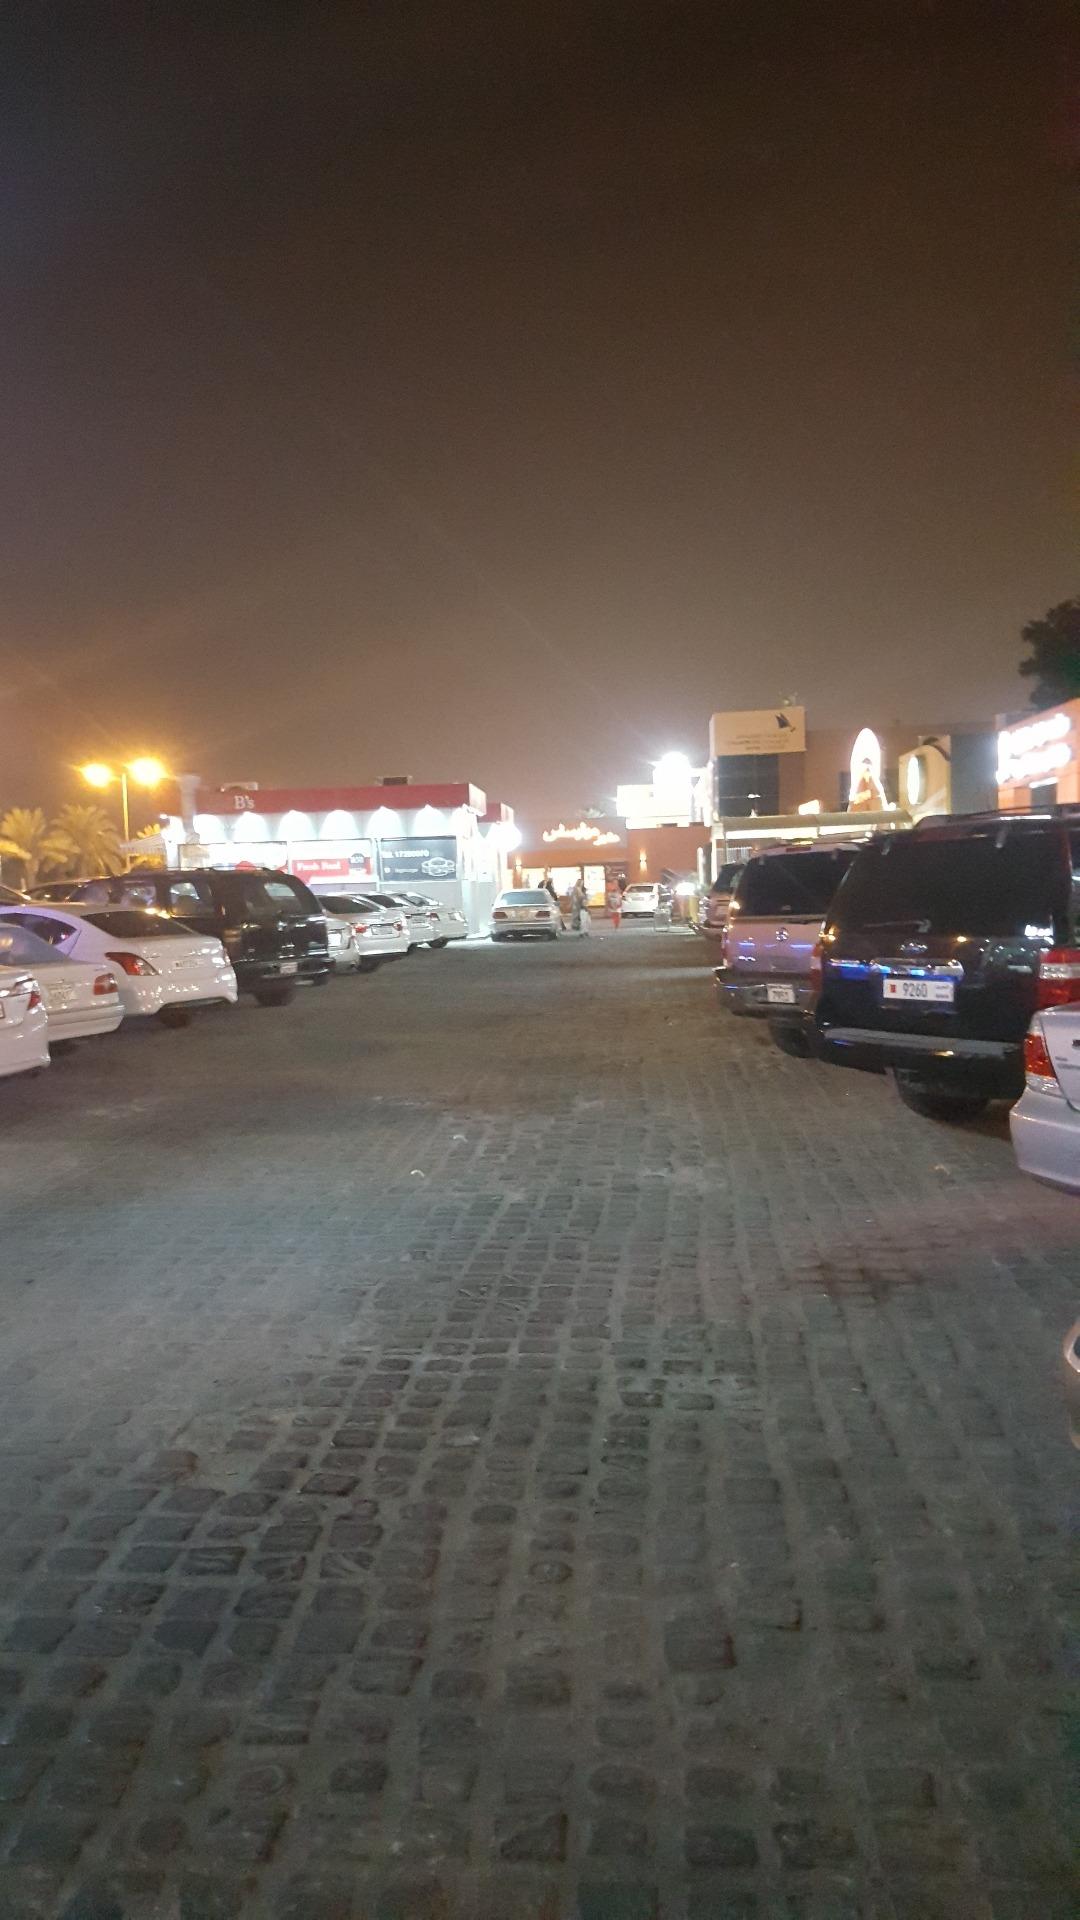 ساليا سي فود - البحرين